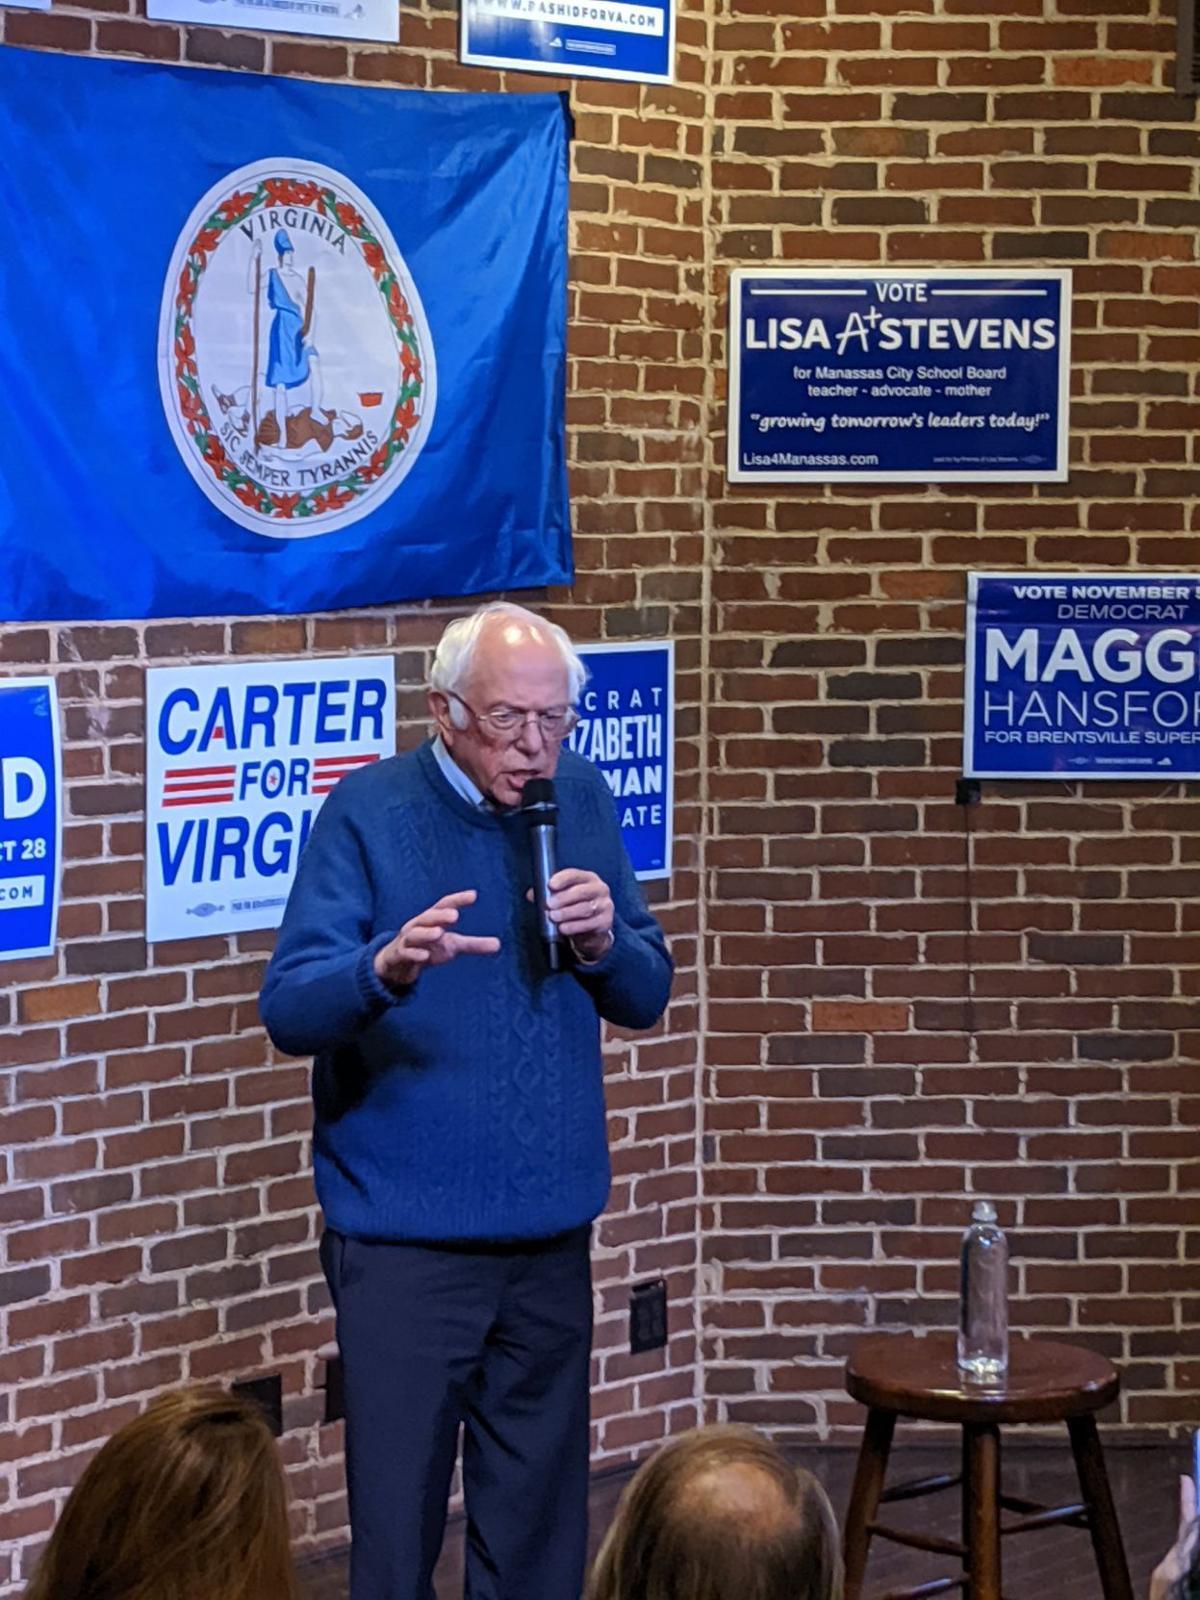 Sanders campaigns for Democrats in Manassas visit